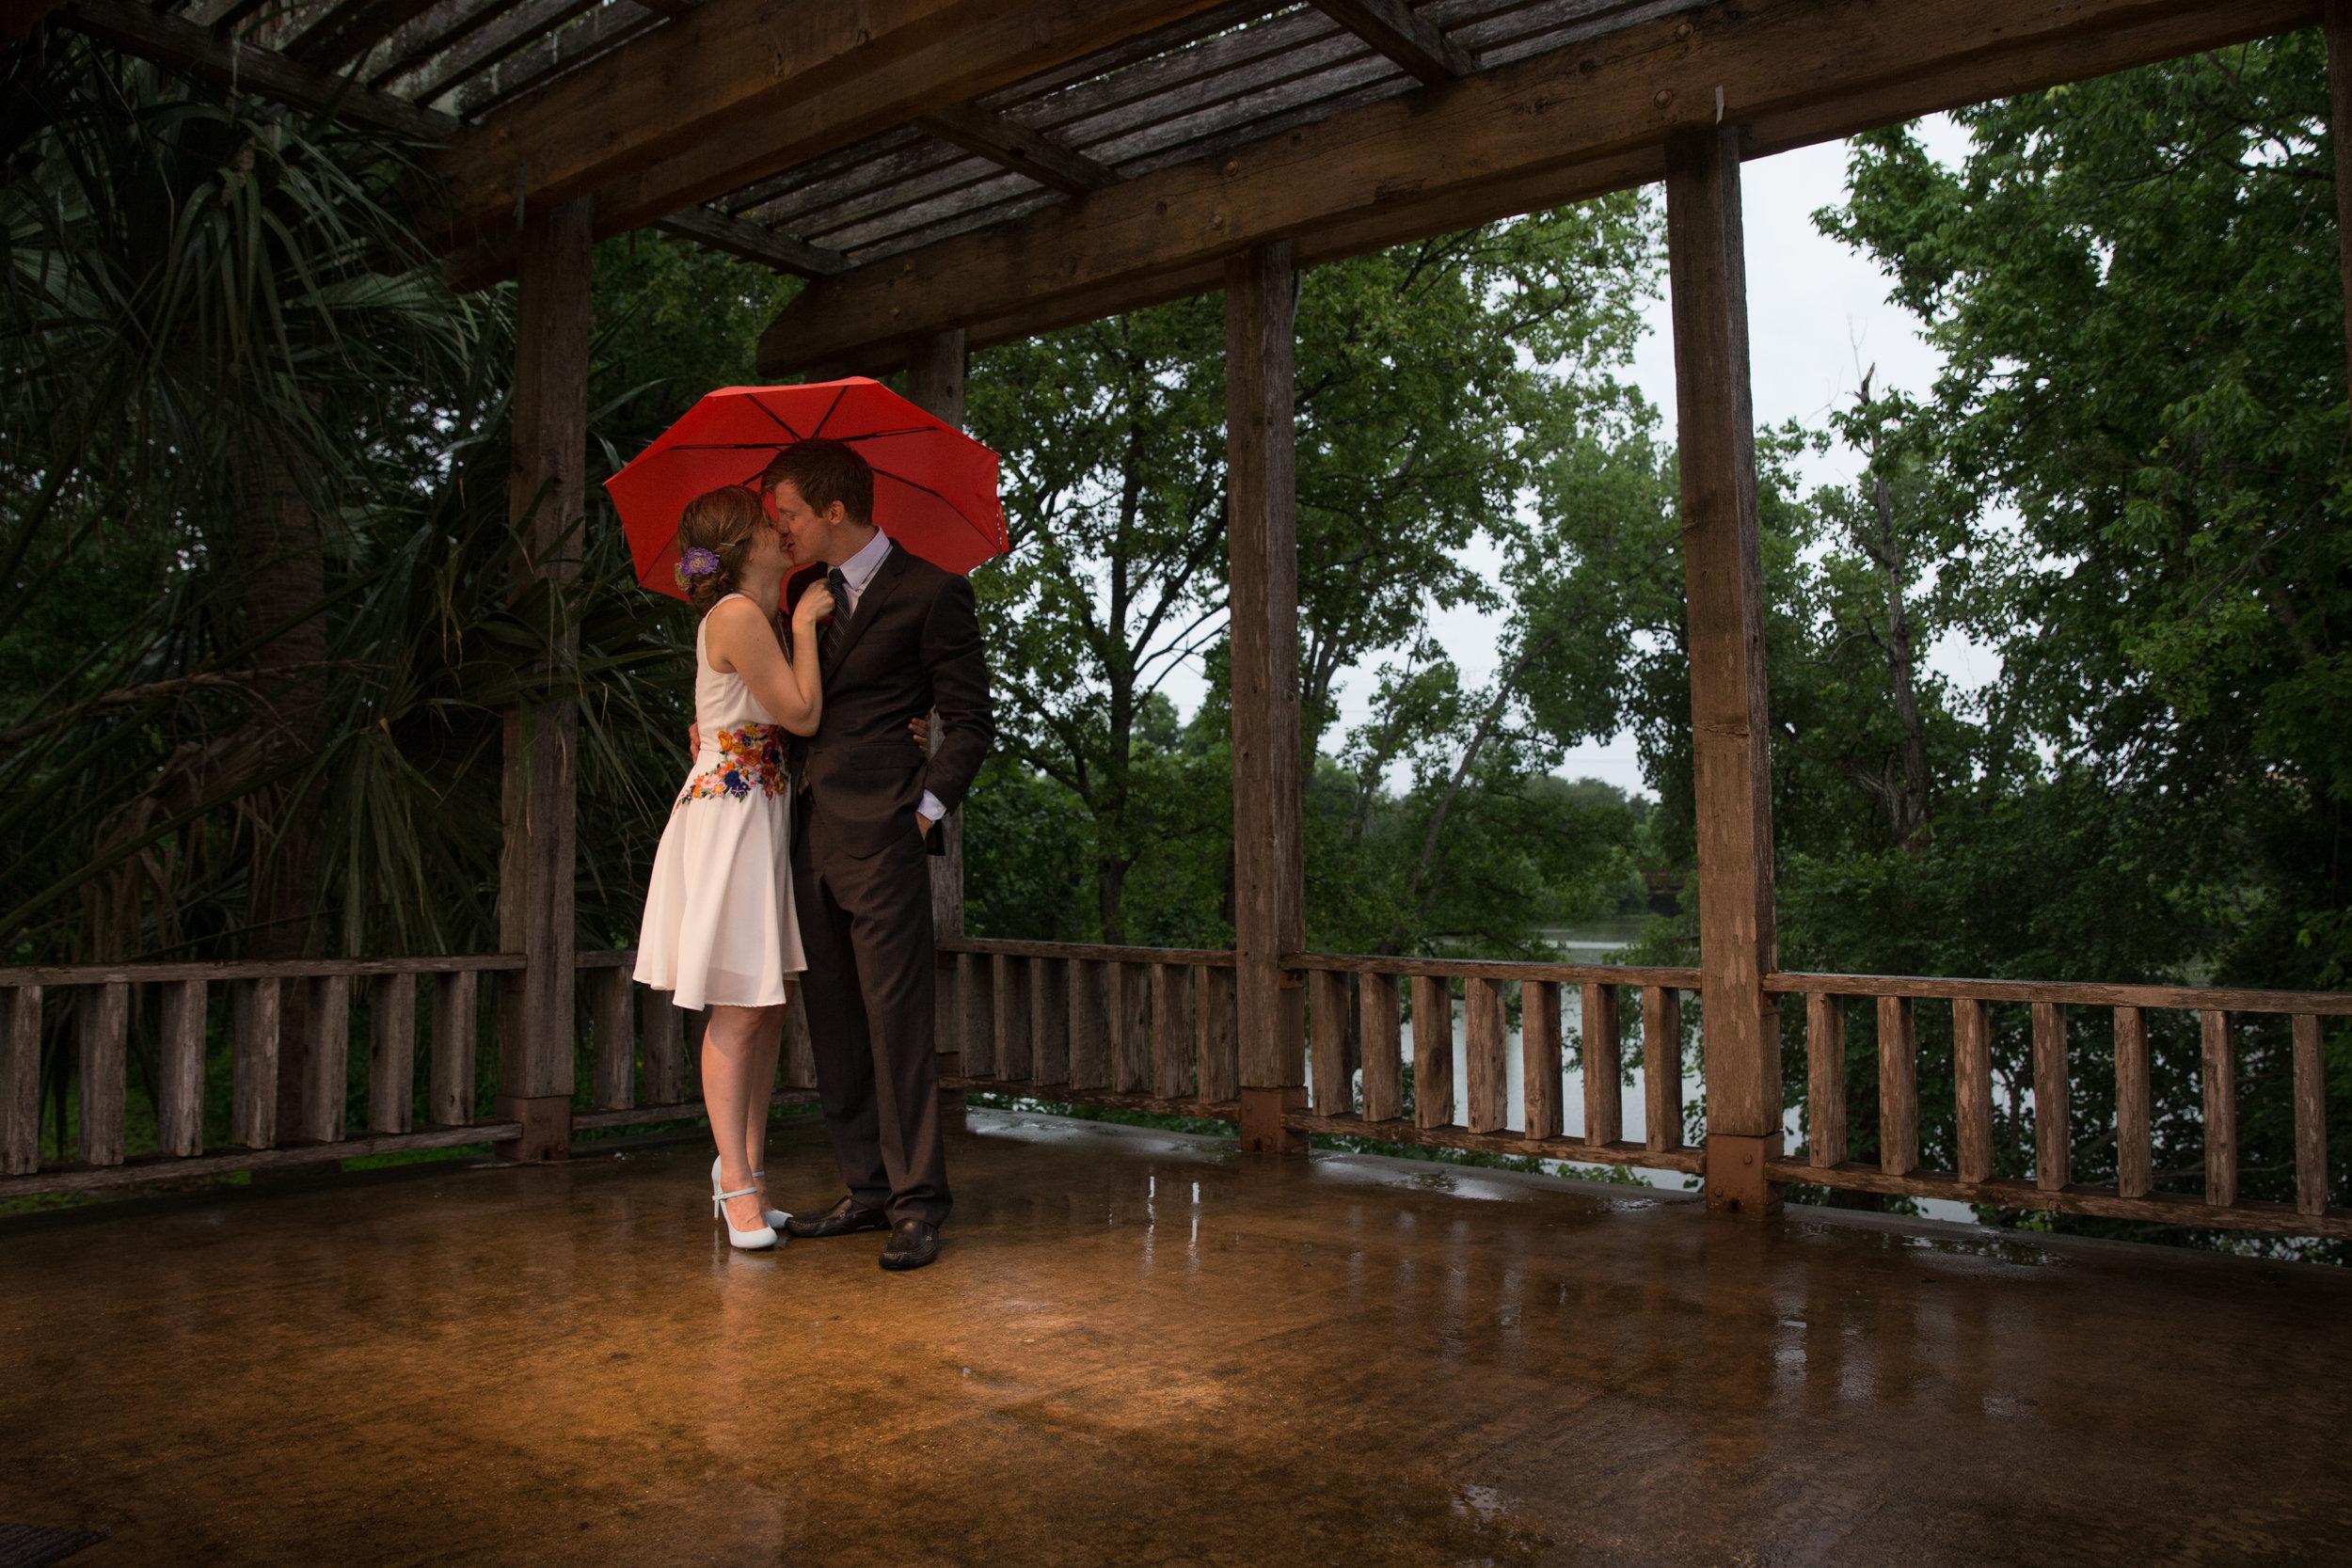 A Rainy Kiss : Award-winning Wedding Photography by Michael Thomas